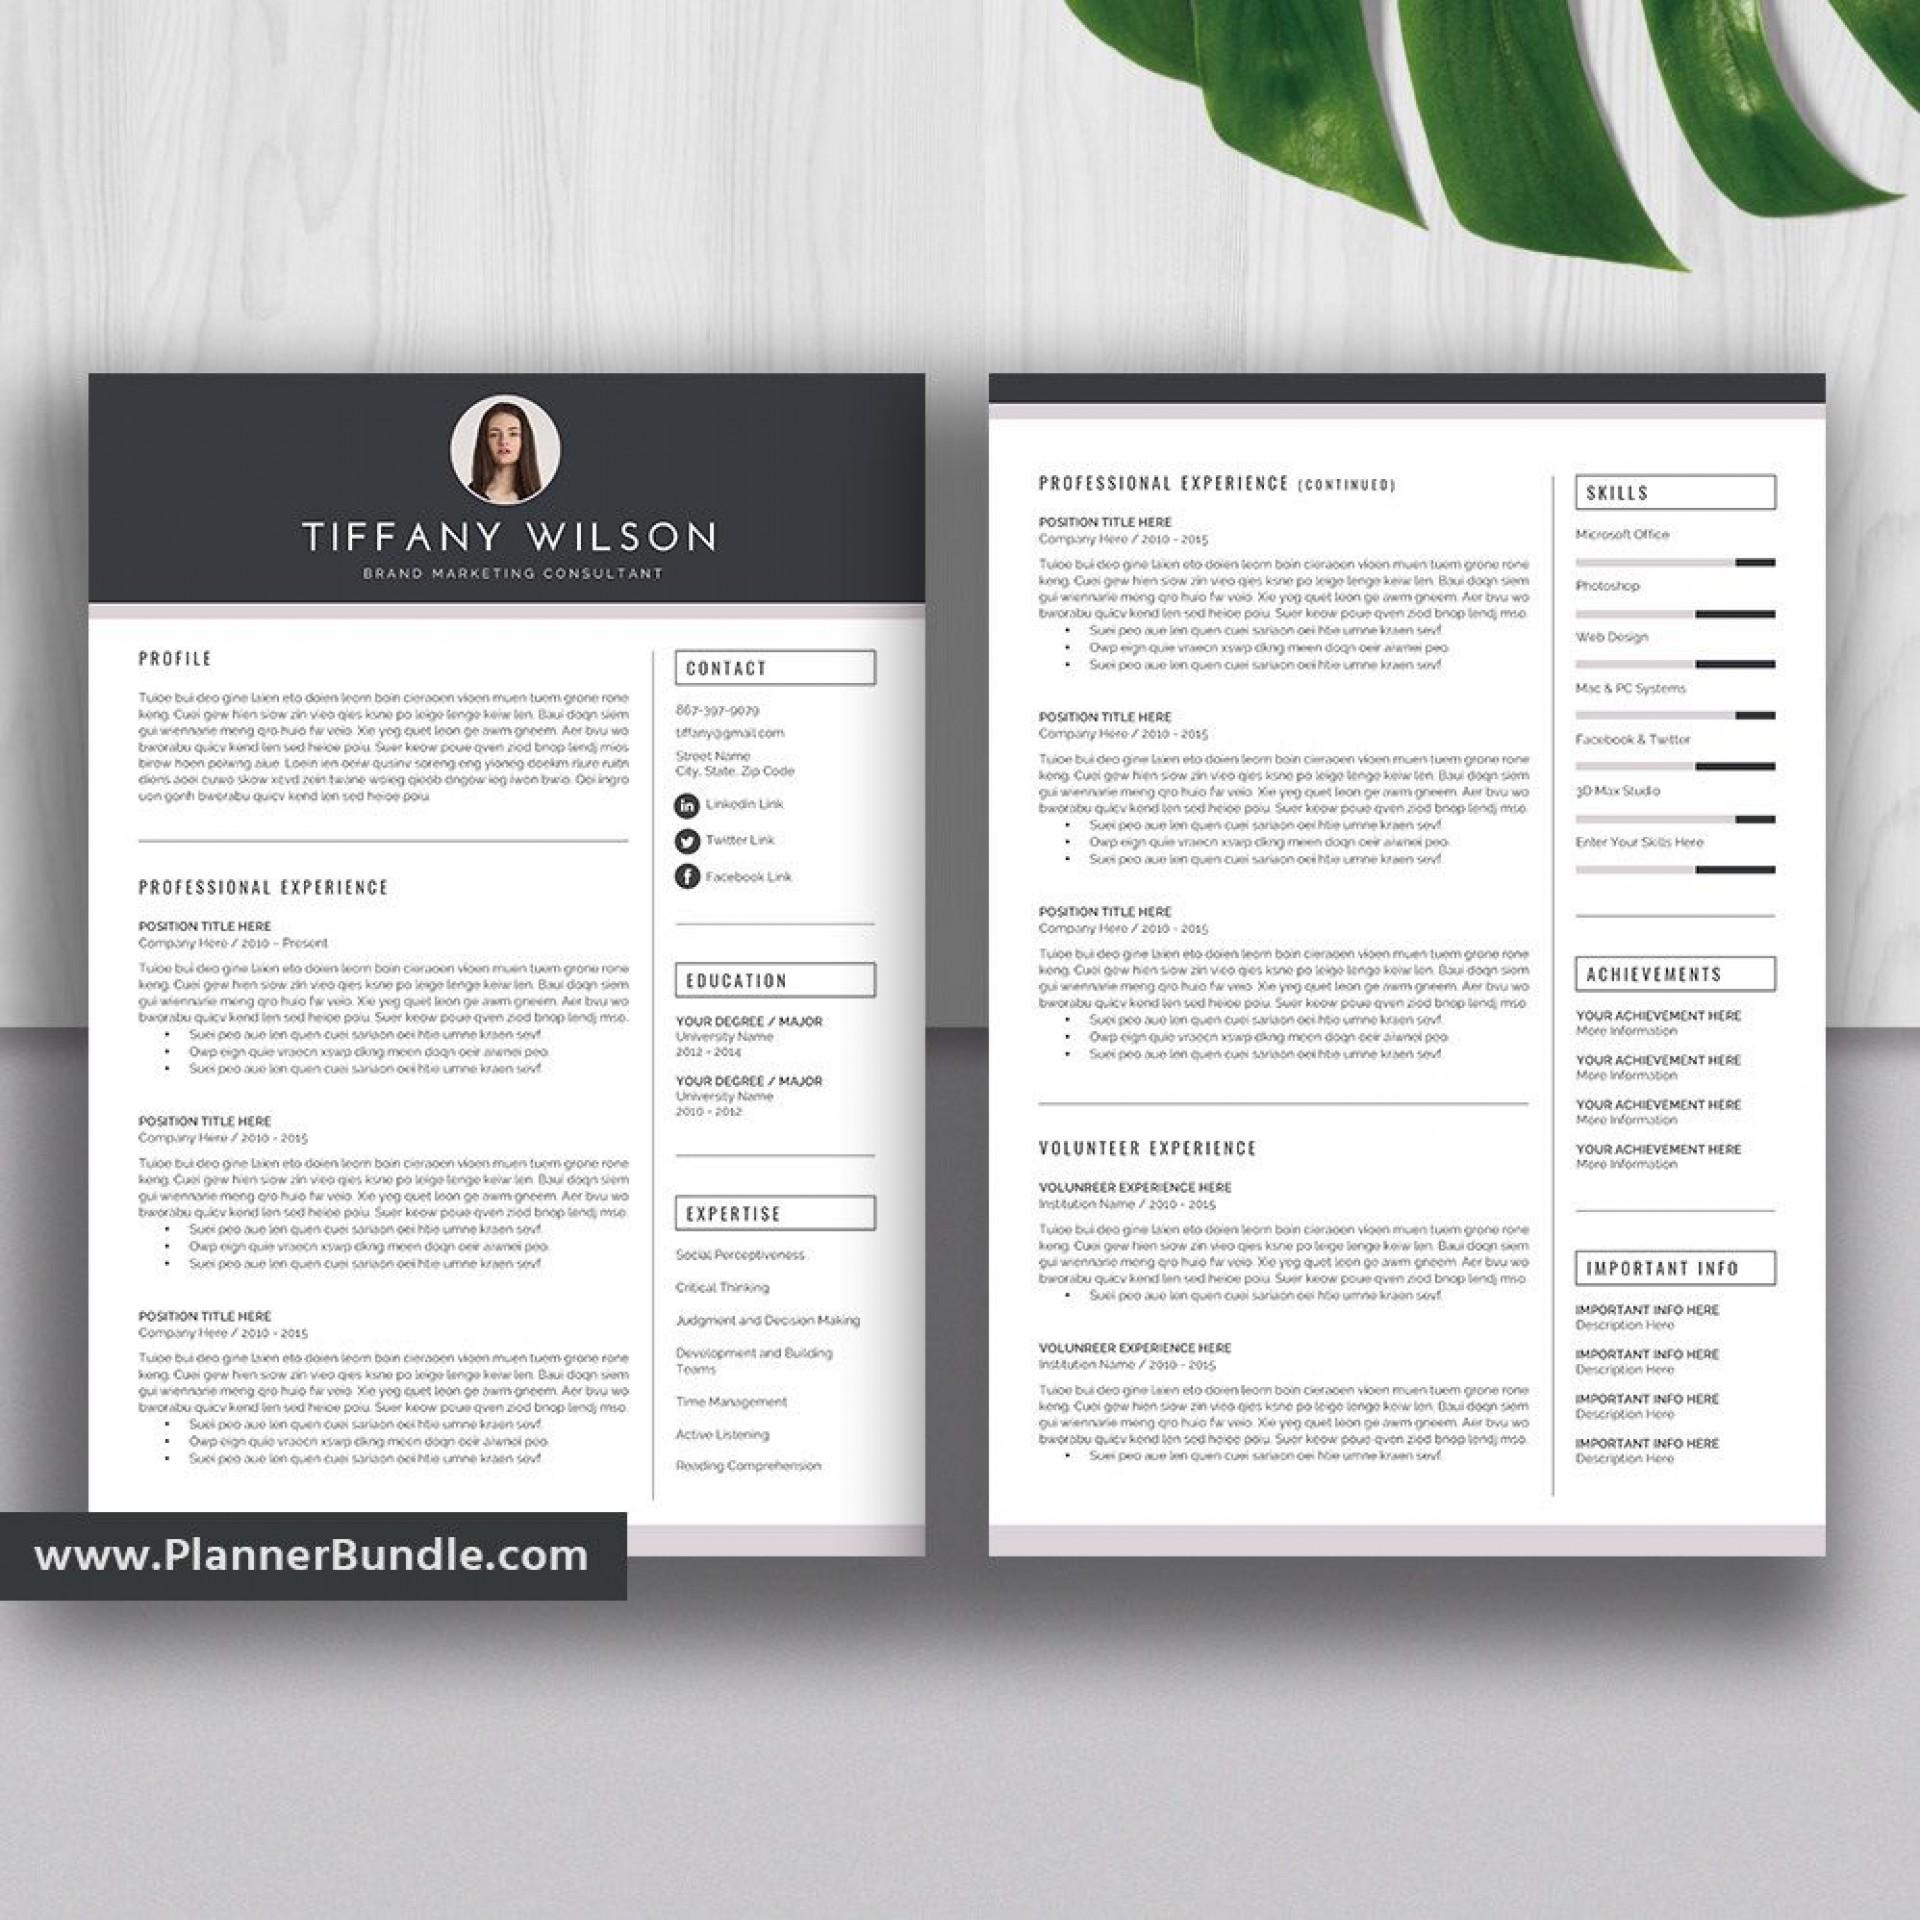 008 Marvelou Graduate School Resume Template Word Image  High Microsoft1920